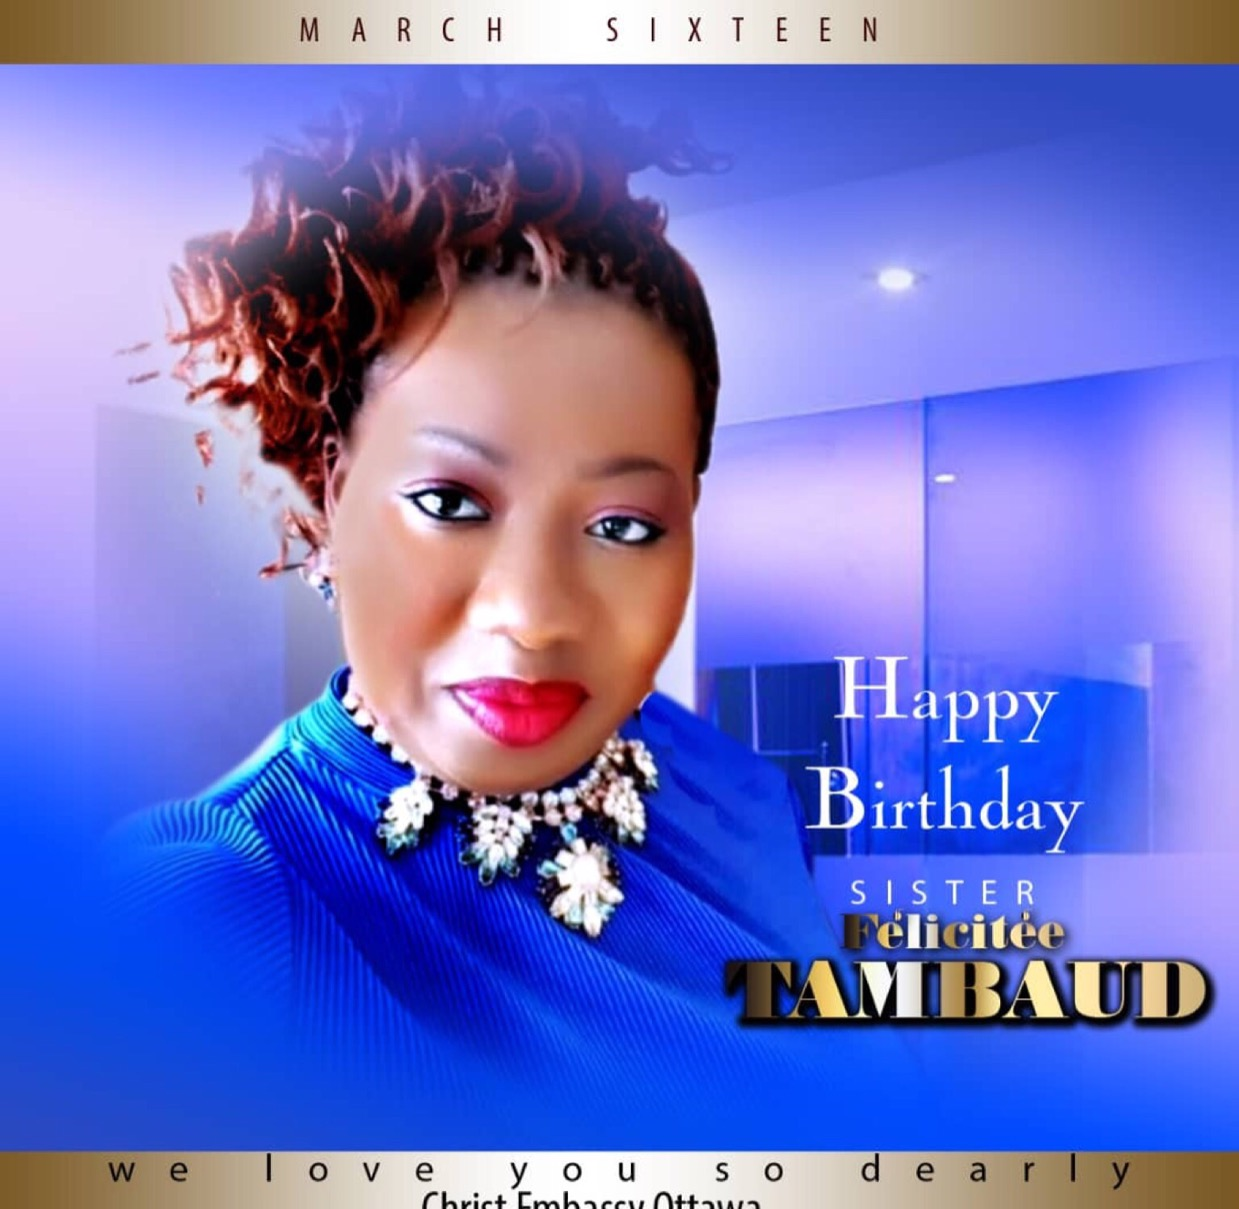 Happy Birthday Dear Sis Felicitee.